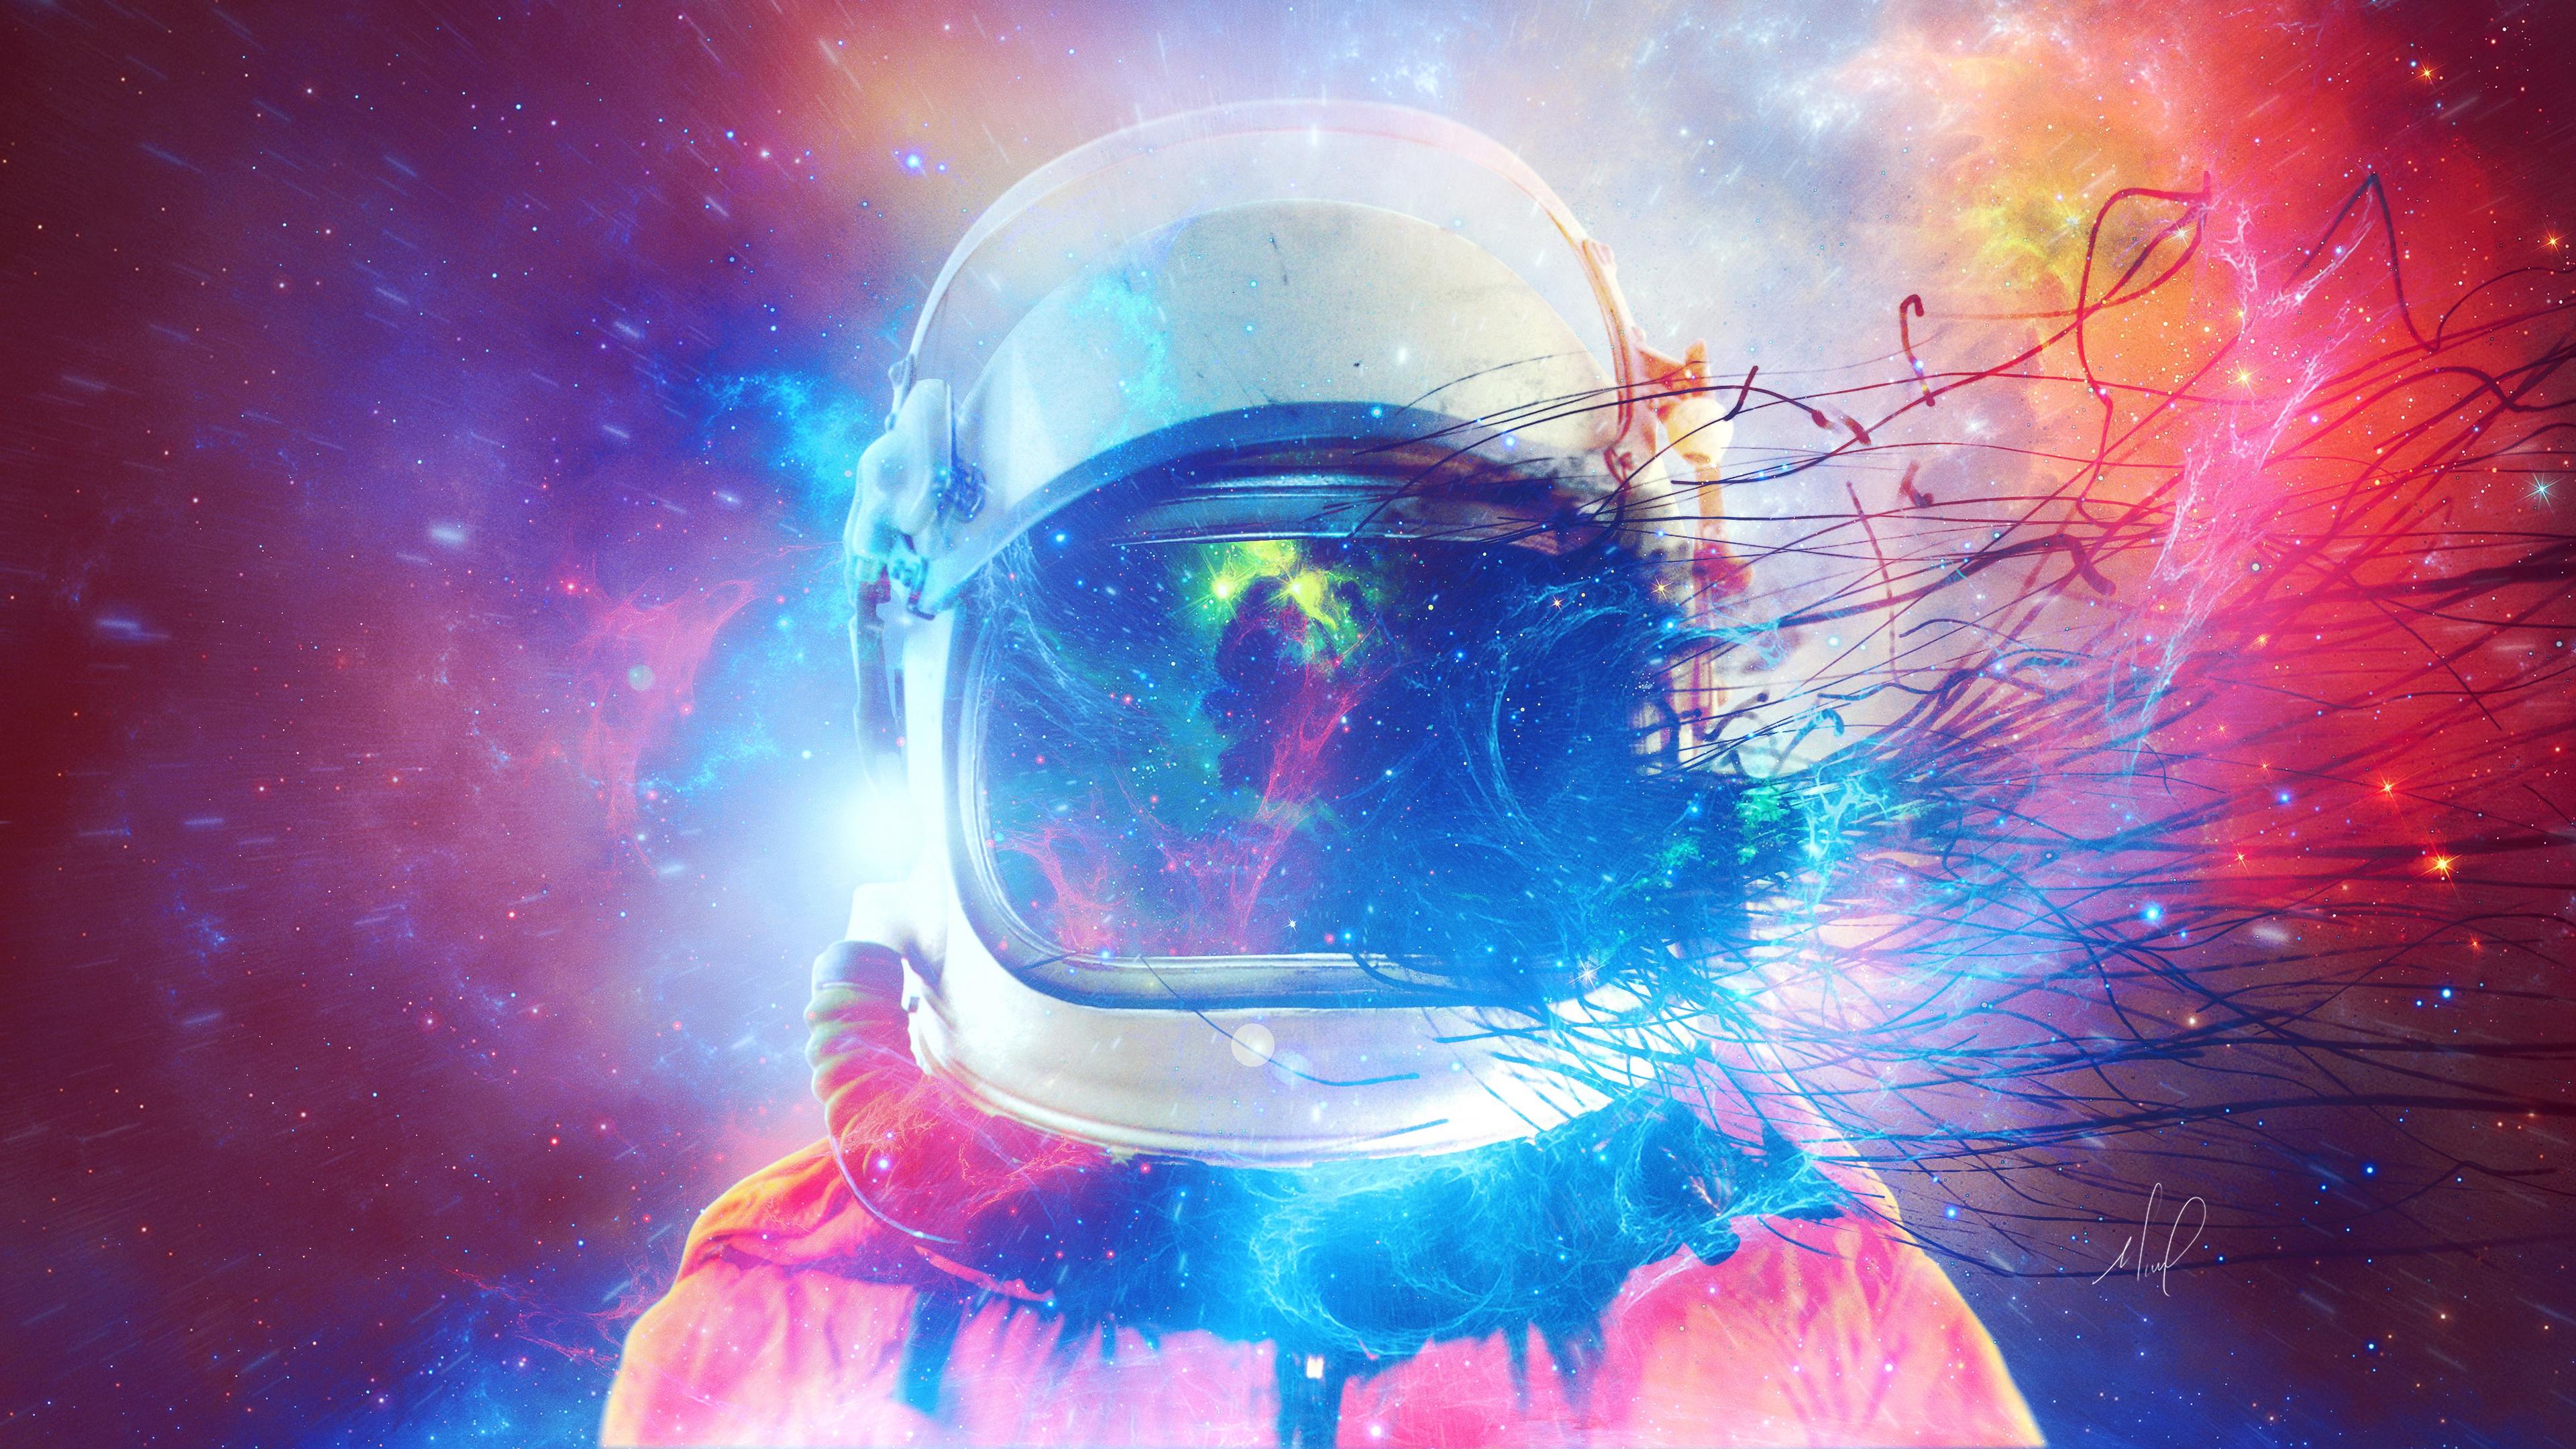 cosmonaut space suit multicolored space 4k 1536016994 - cosmonaut, space suit, multicolored, space 4k - space suit, multicolored, cosmonaut